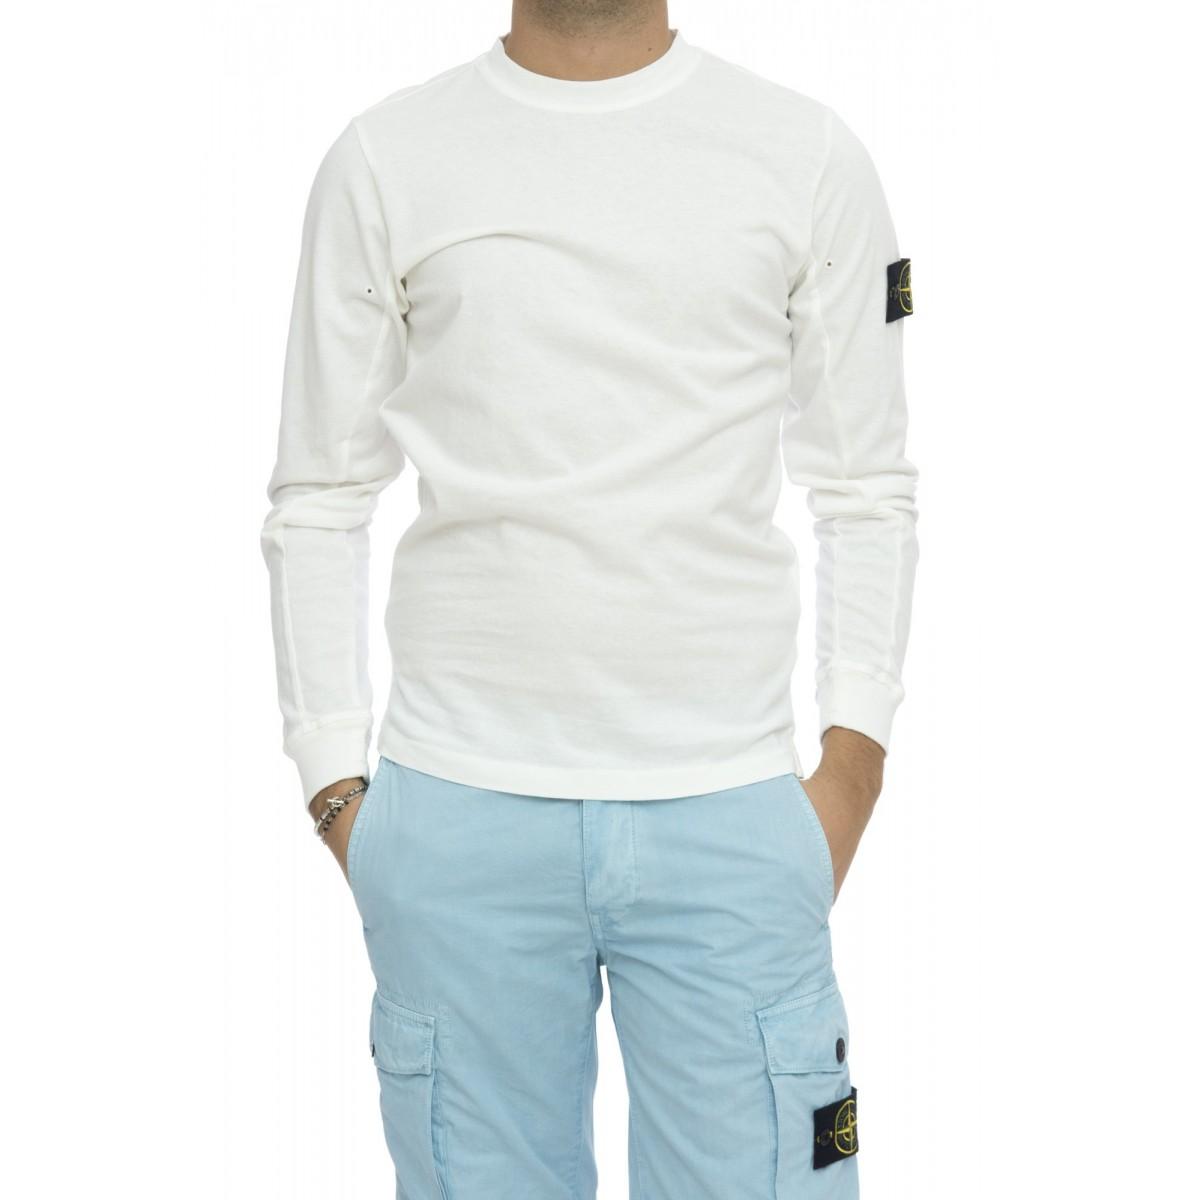 T-shirt - 22819 t-shirt manica lunga